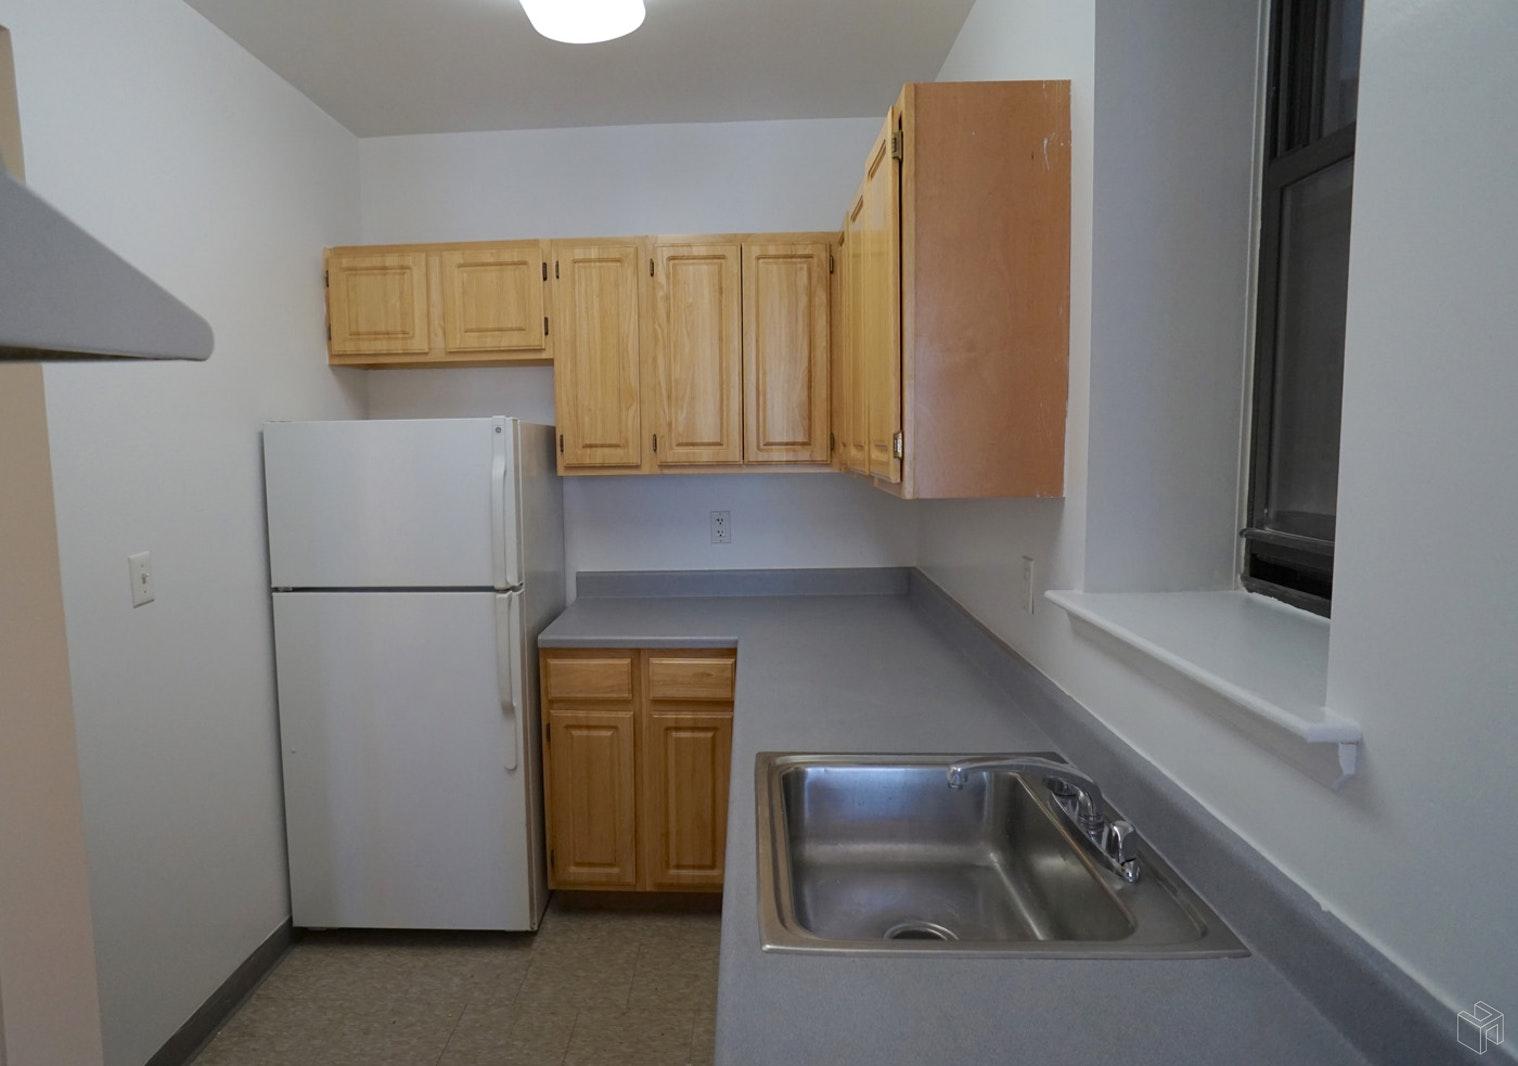 86 LEXINGTON AVENUE 2B, Clinton Hill, $1,900, Web #: 19576045